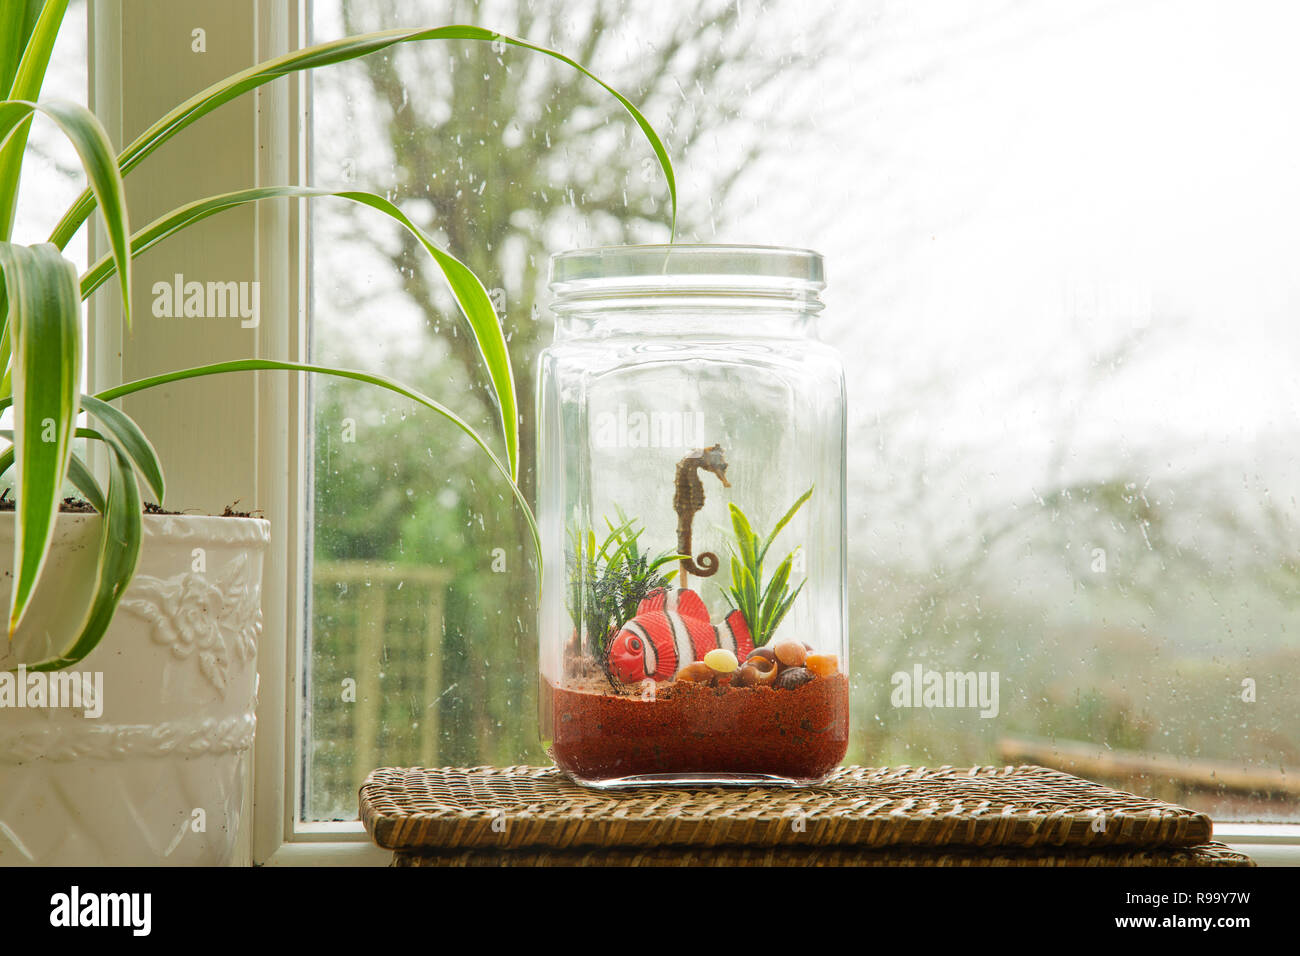 Mini aquarium made with old glass jars - Stock Image